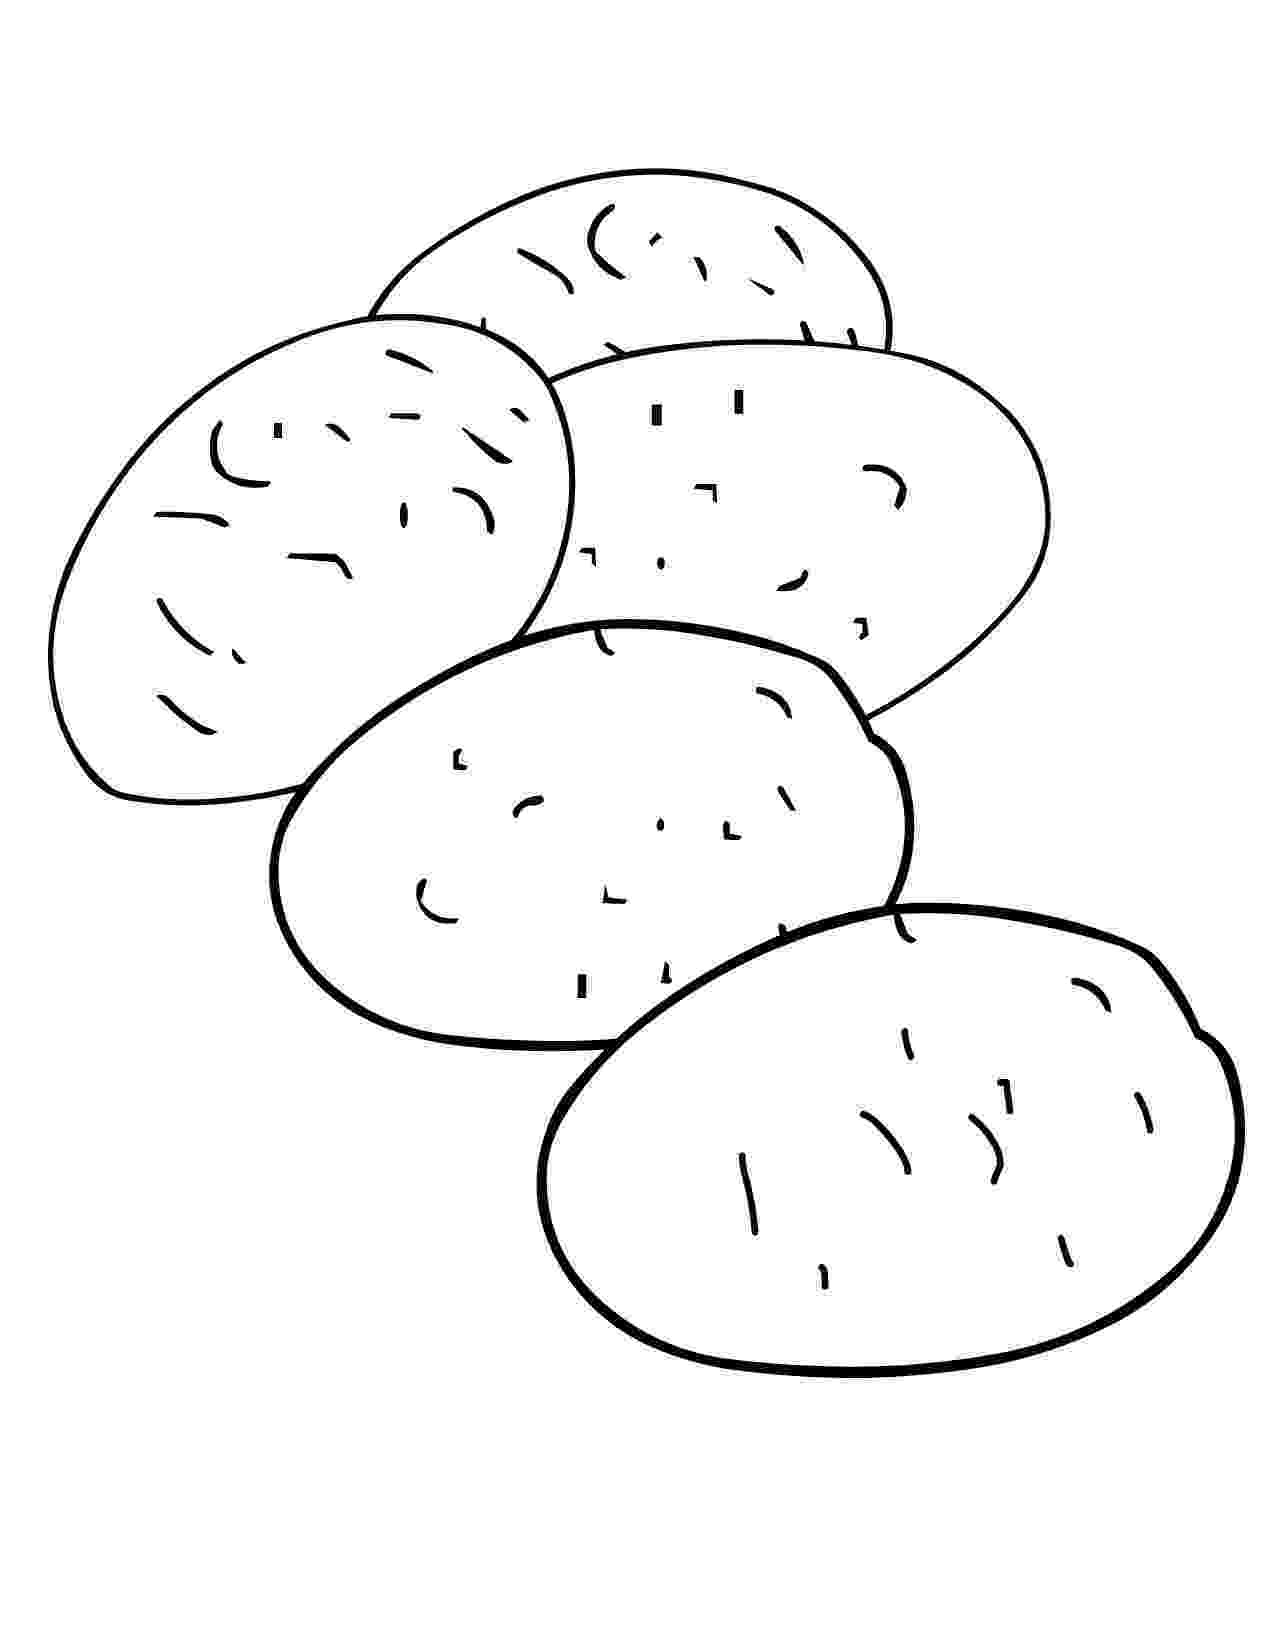 potato pictures for colouring potato coloring page twisty noodle pictures colouring potato for